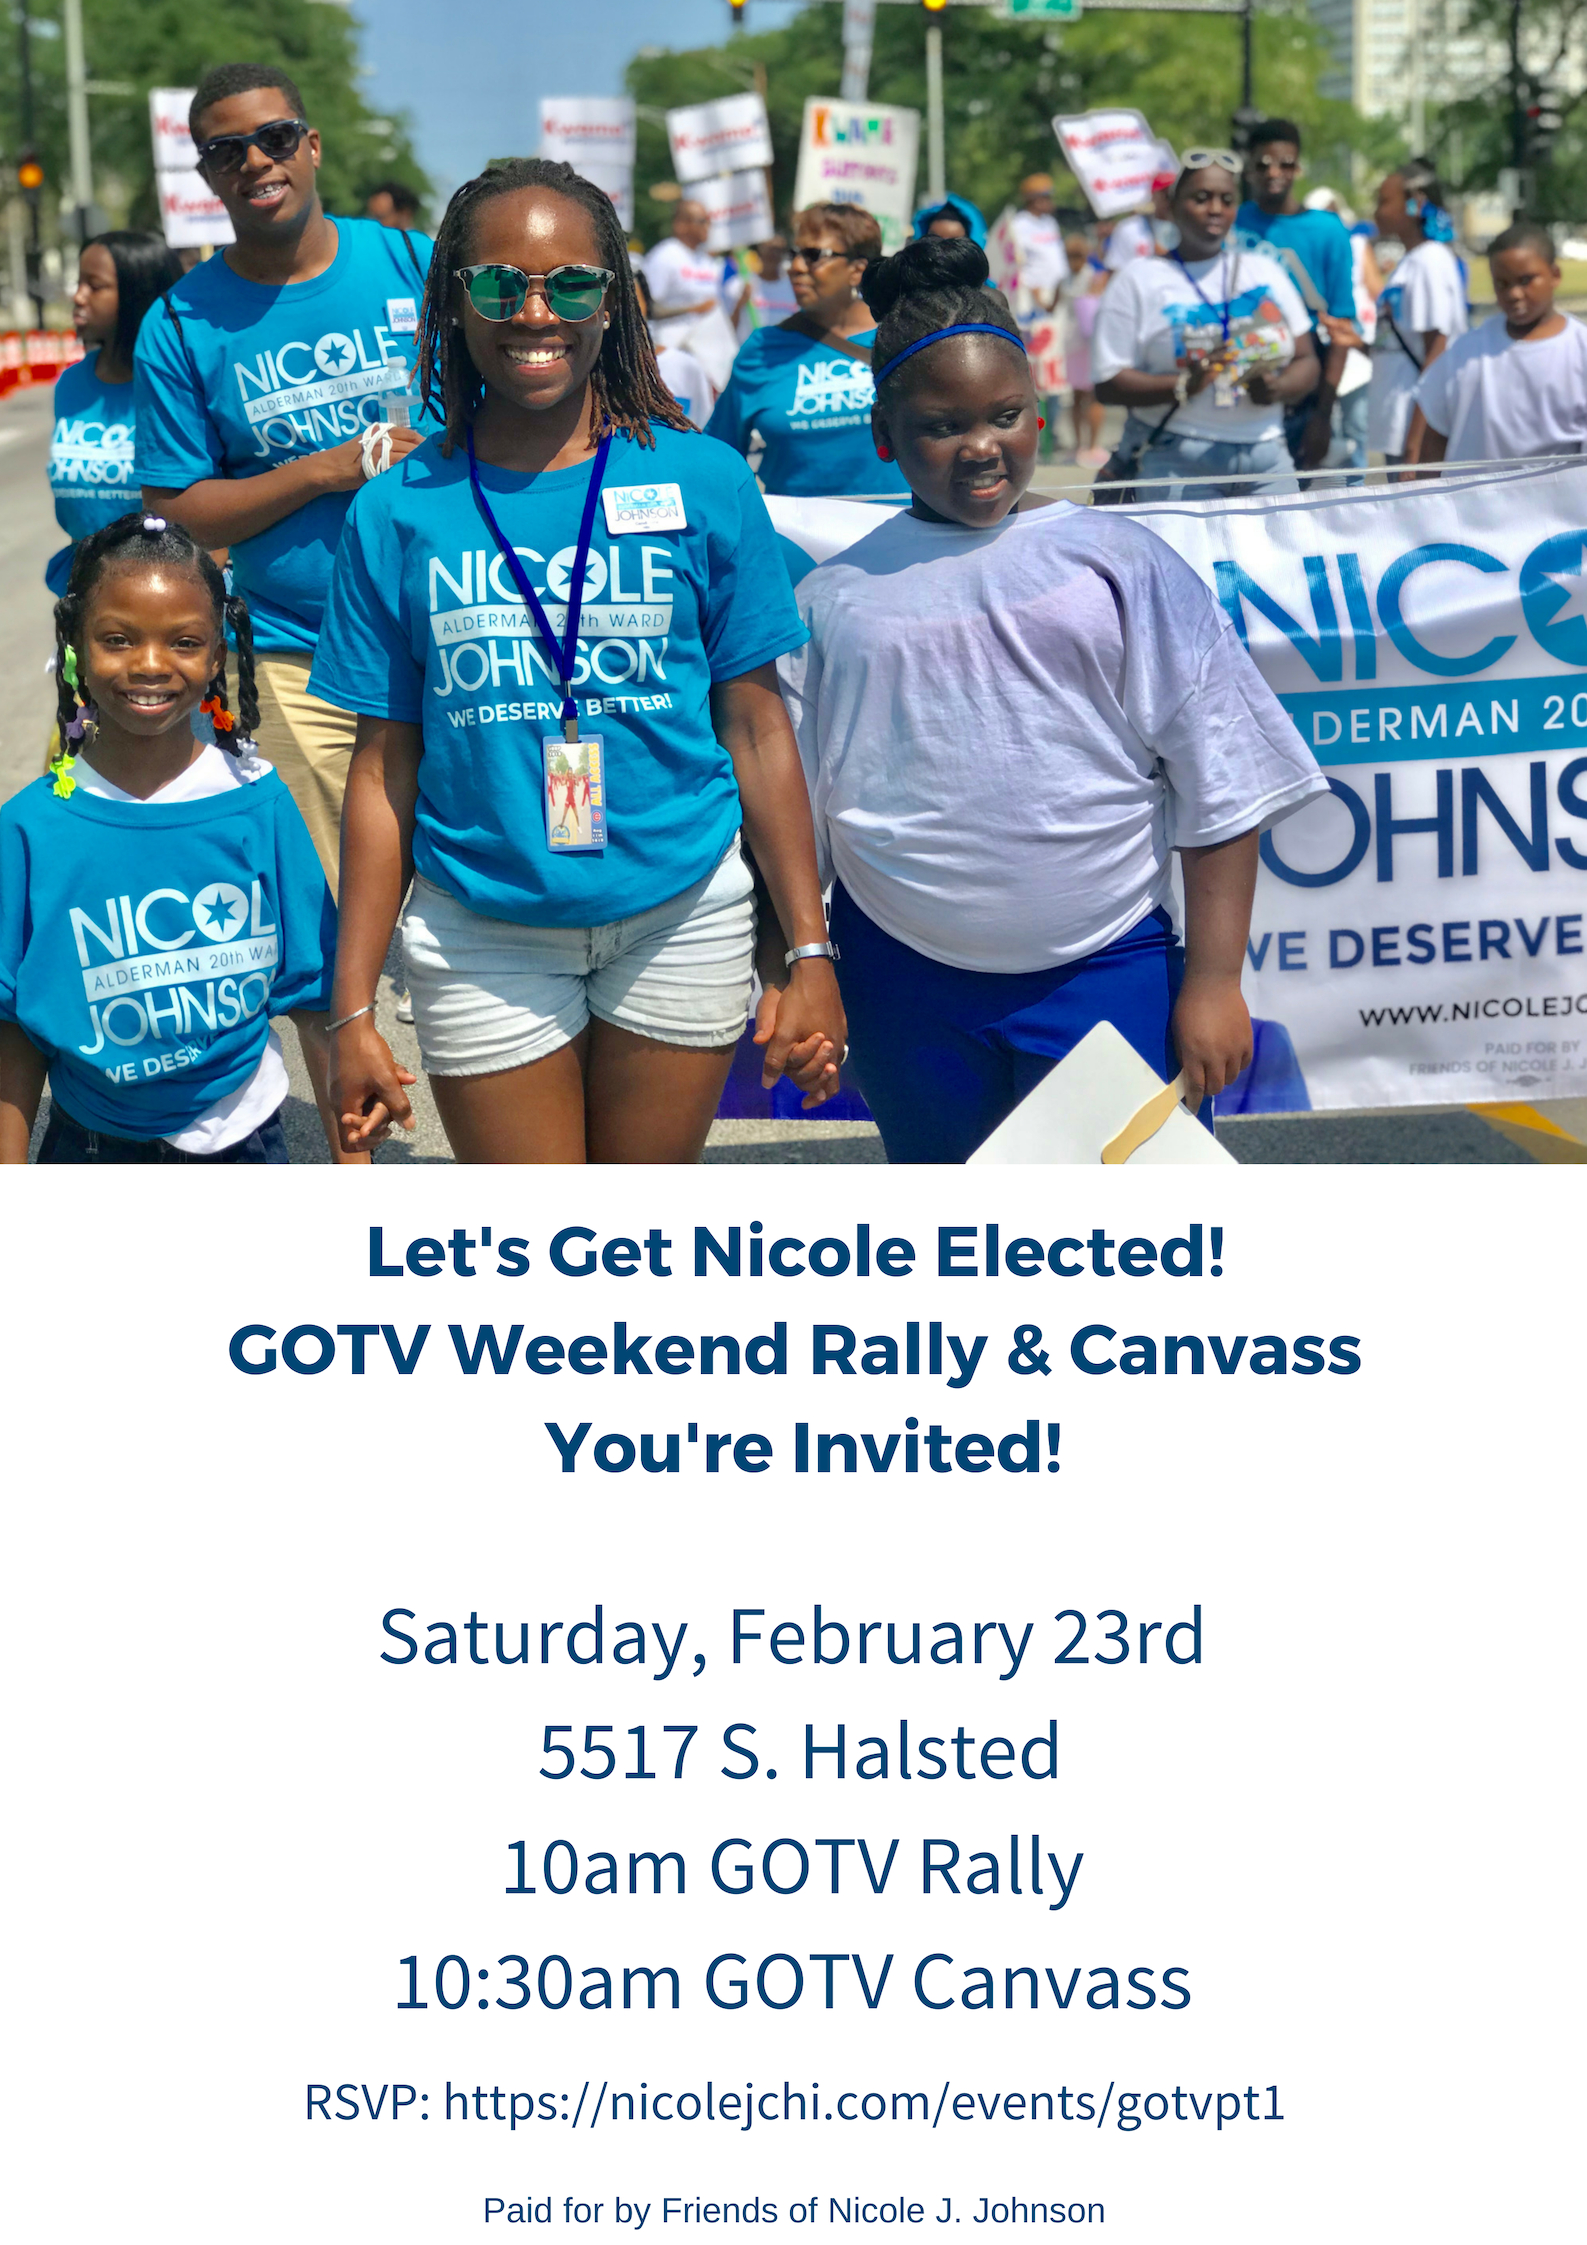 GOTV Rally and Canvass.jpg